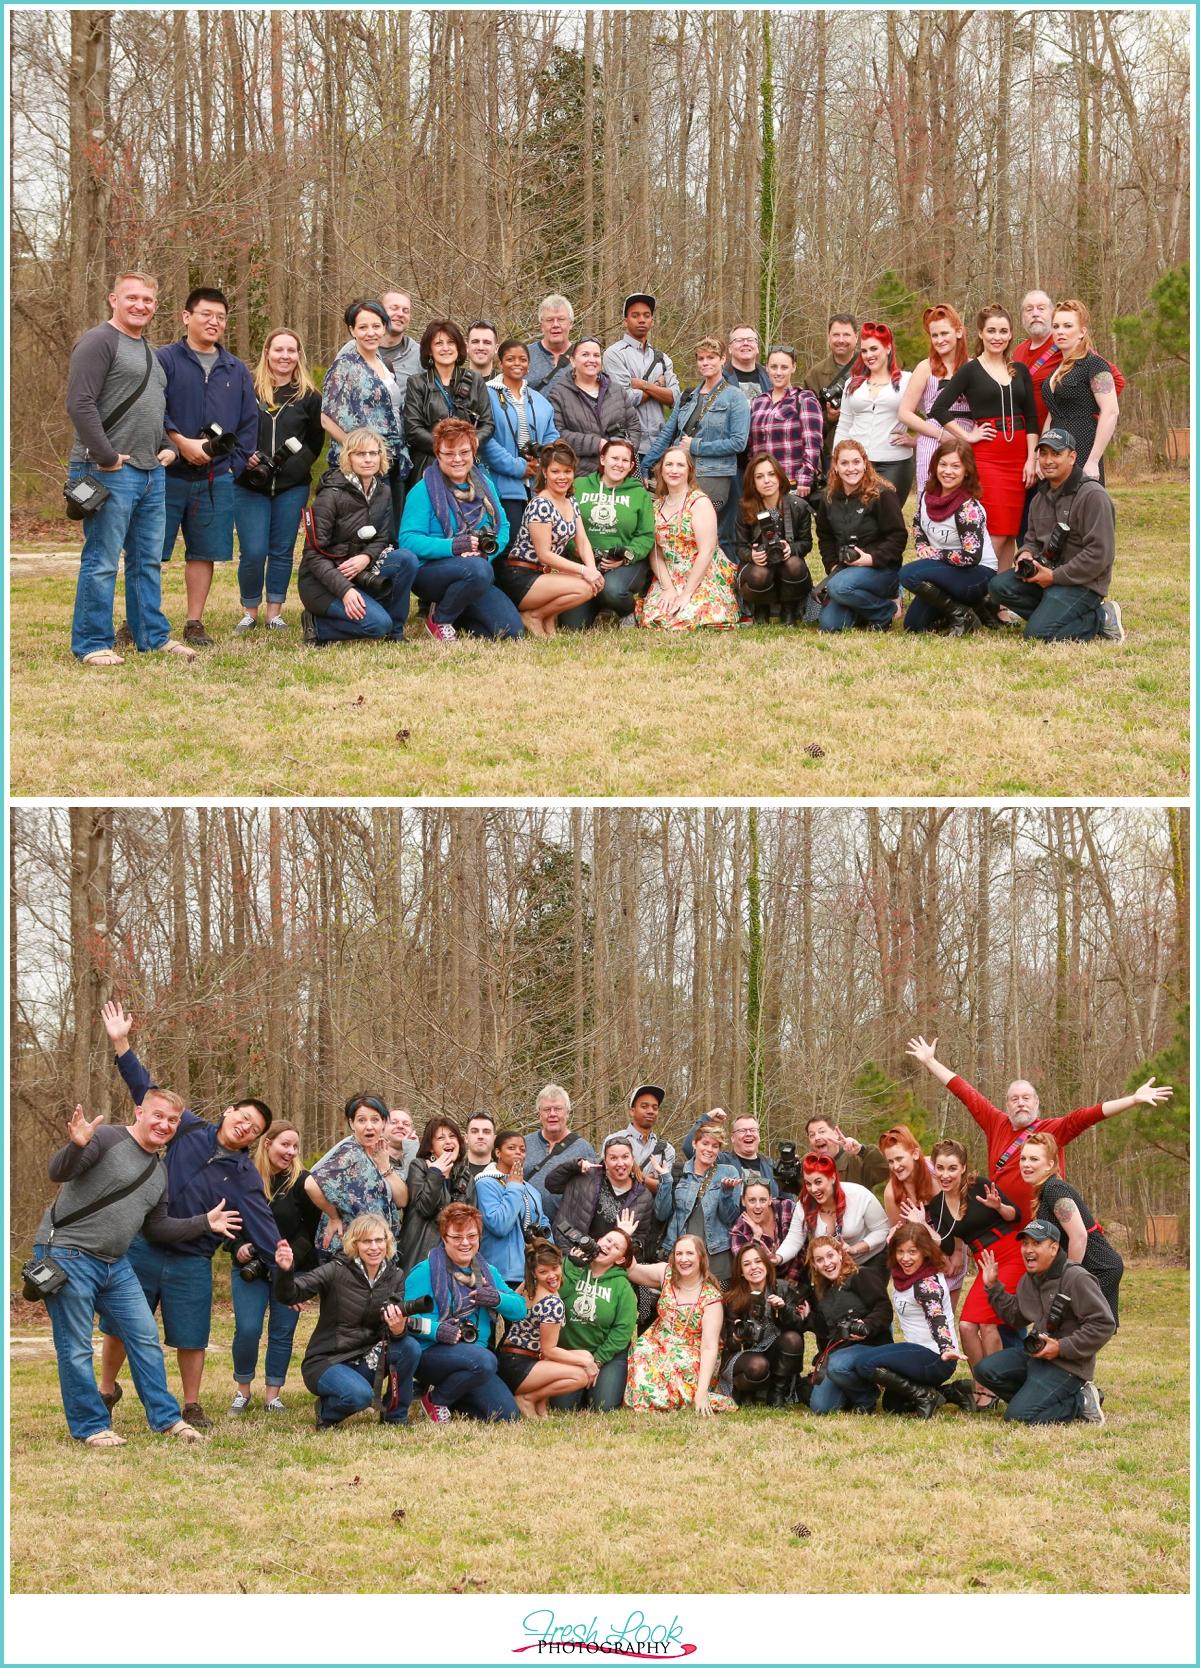 photographers goofing off